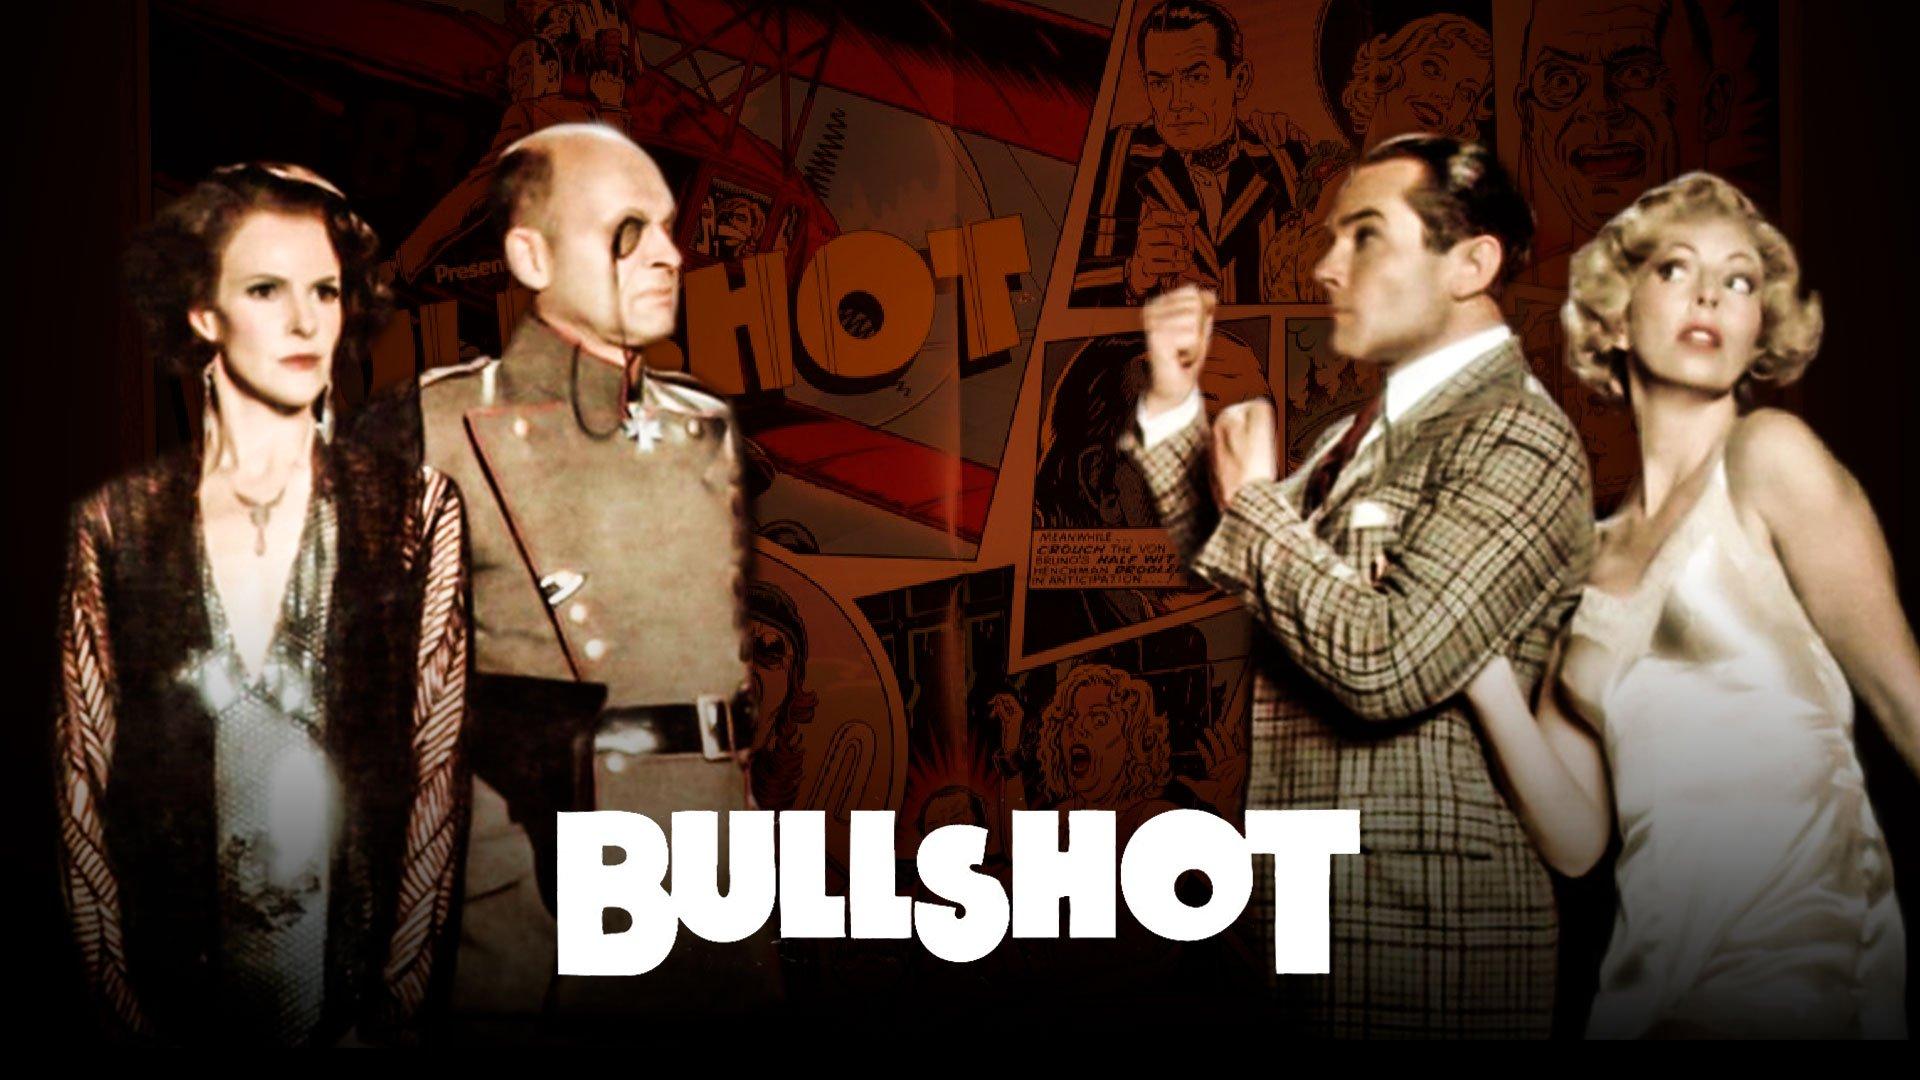 Bullshot on BritBox UK